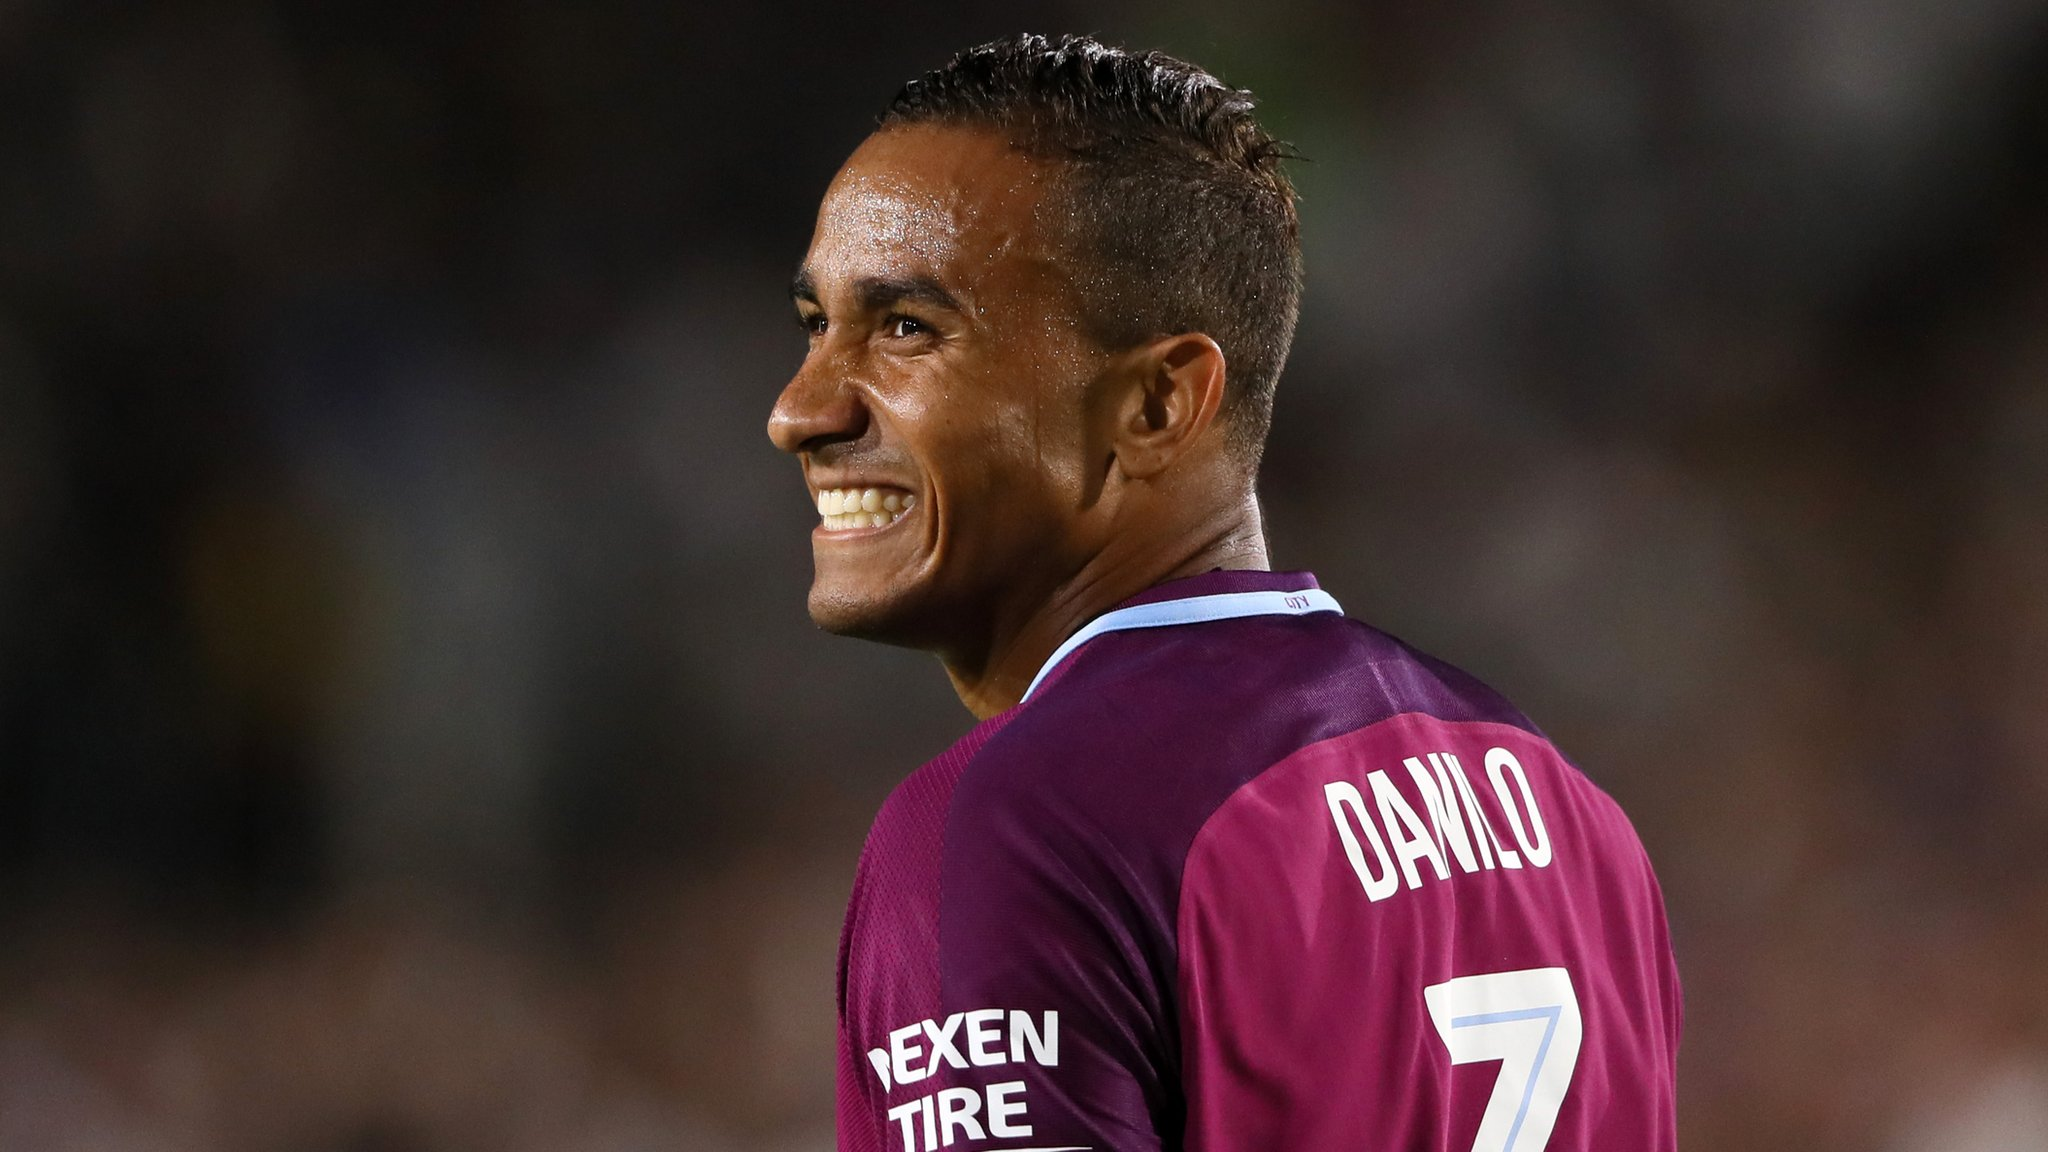 Oxford United v Manchester City: Danilo in line for City return